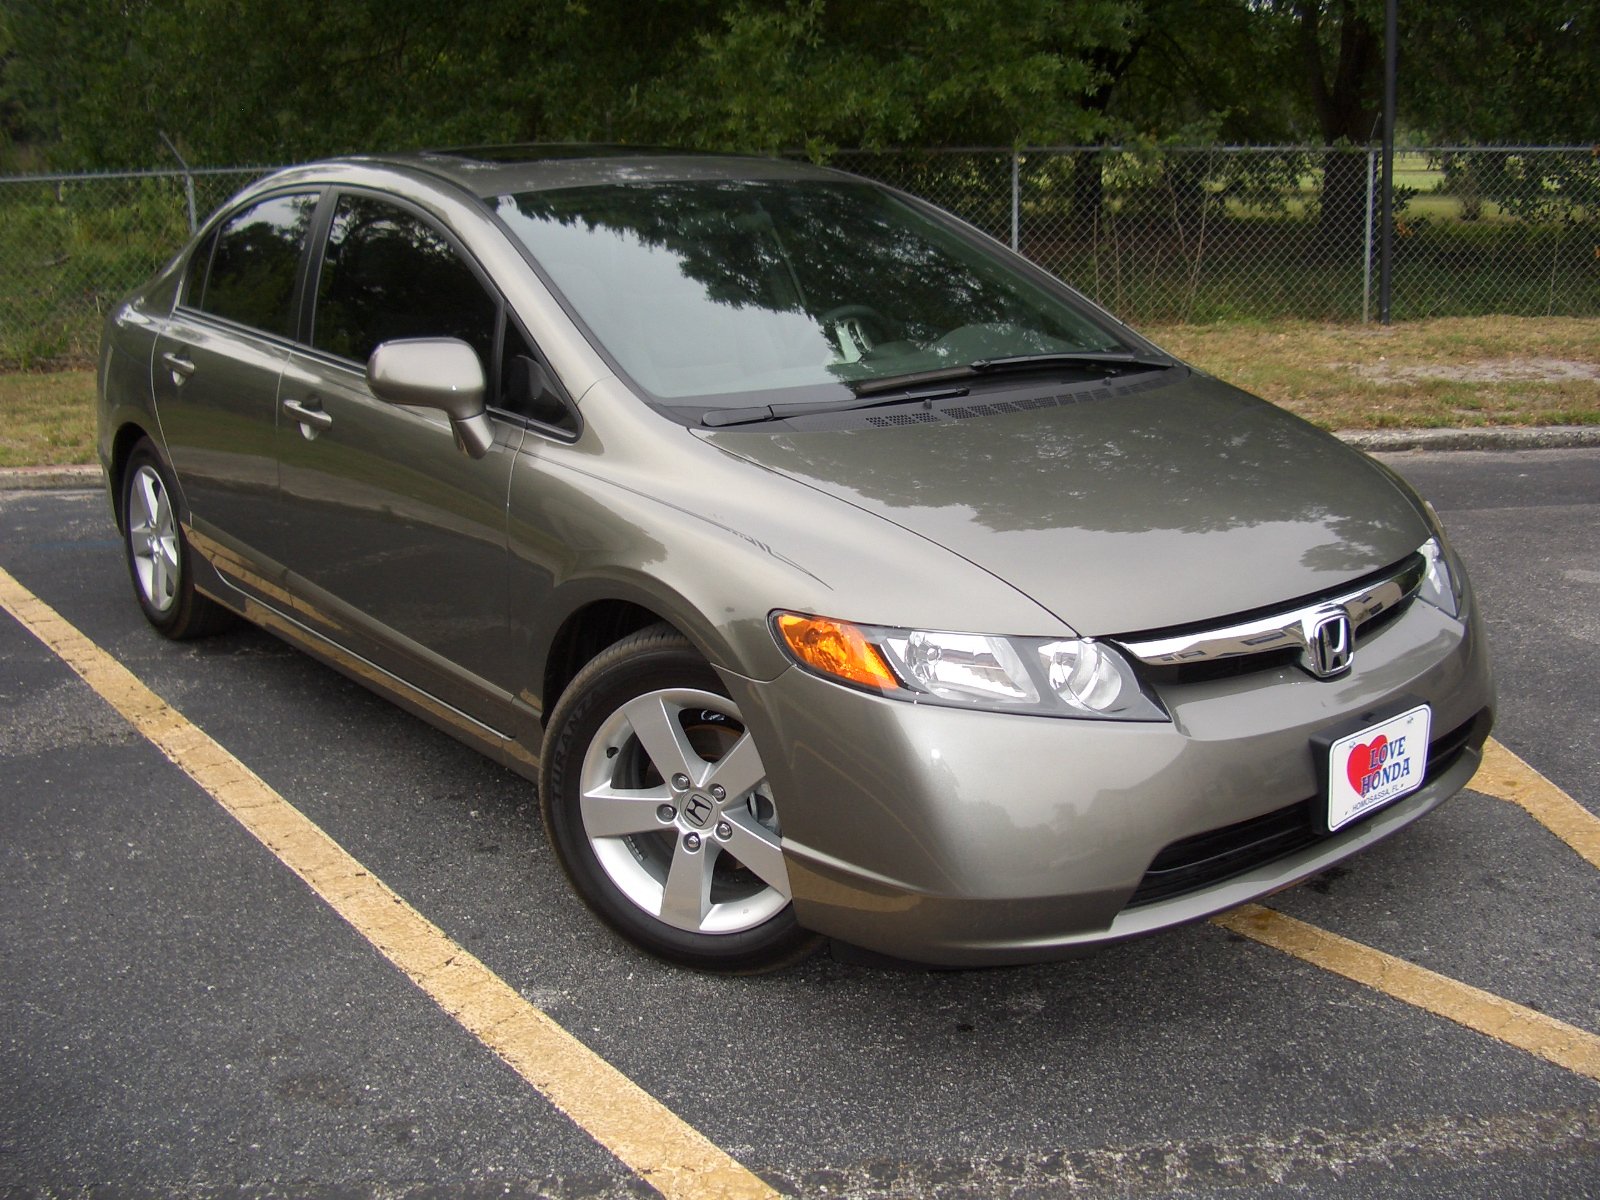 ... Honda Civic photos: view interior and exterior 2007 Honda Civic